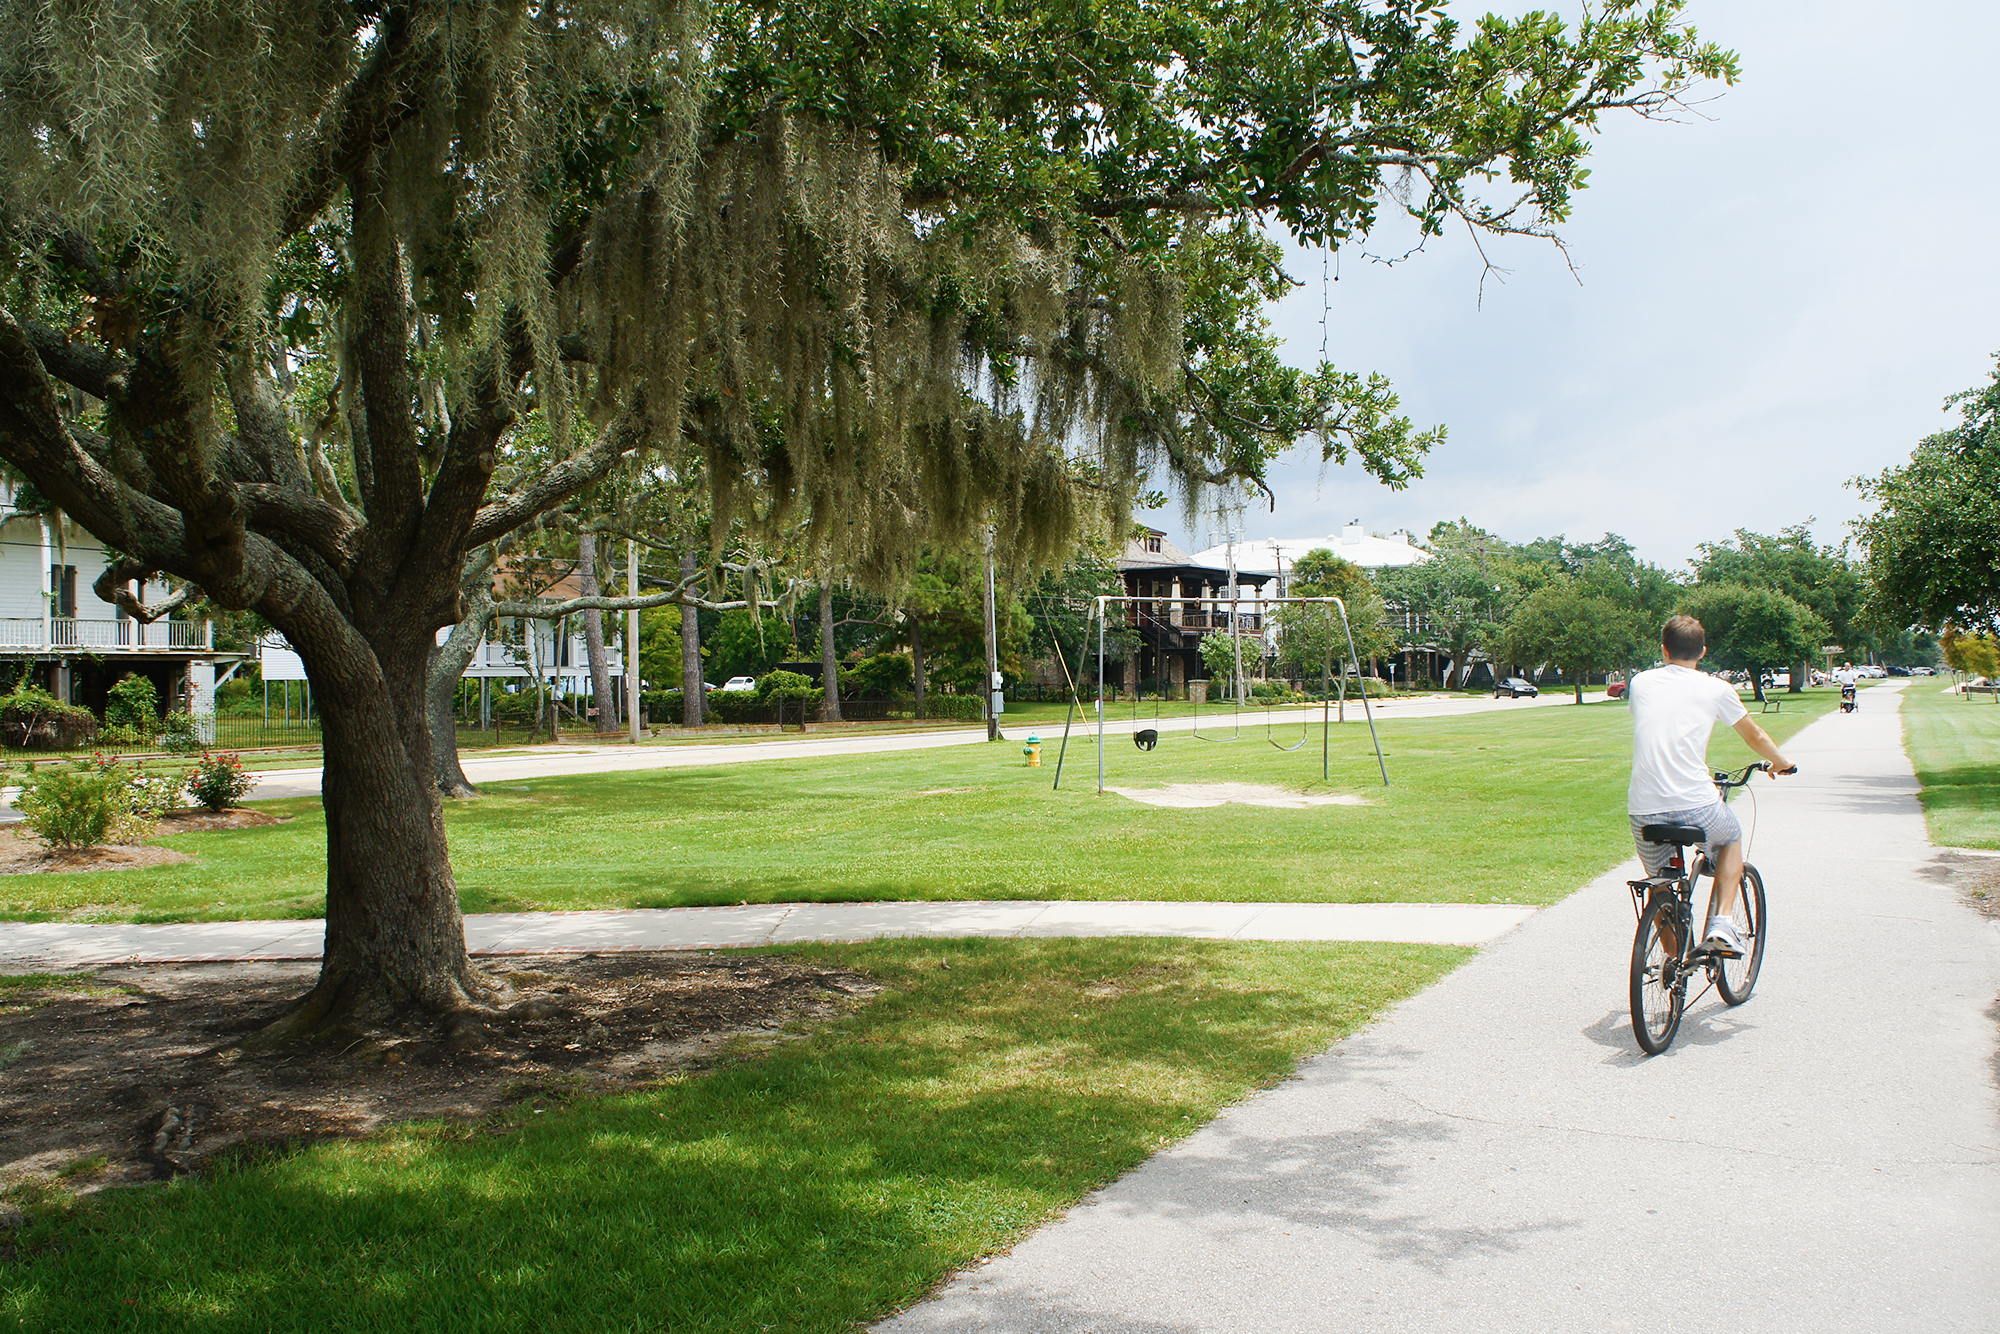 summertime in new orleans